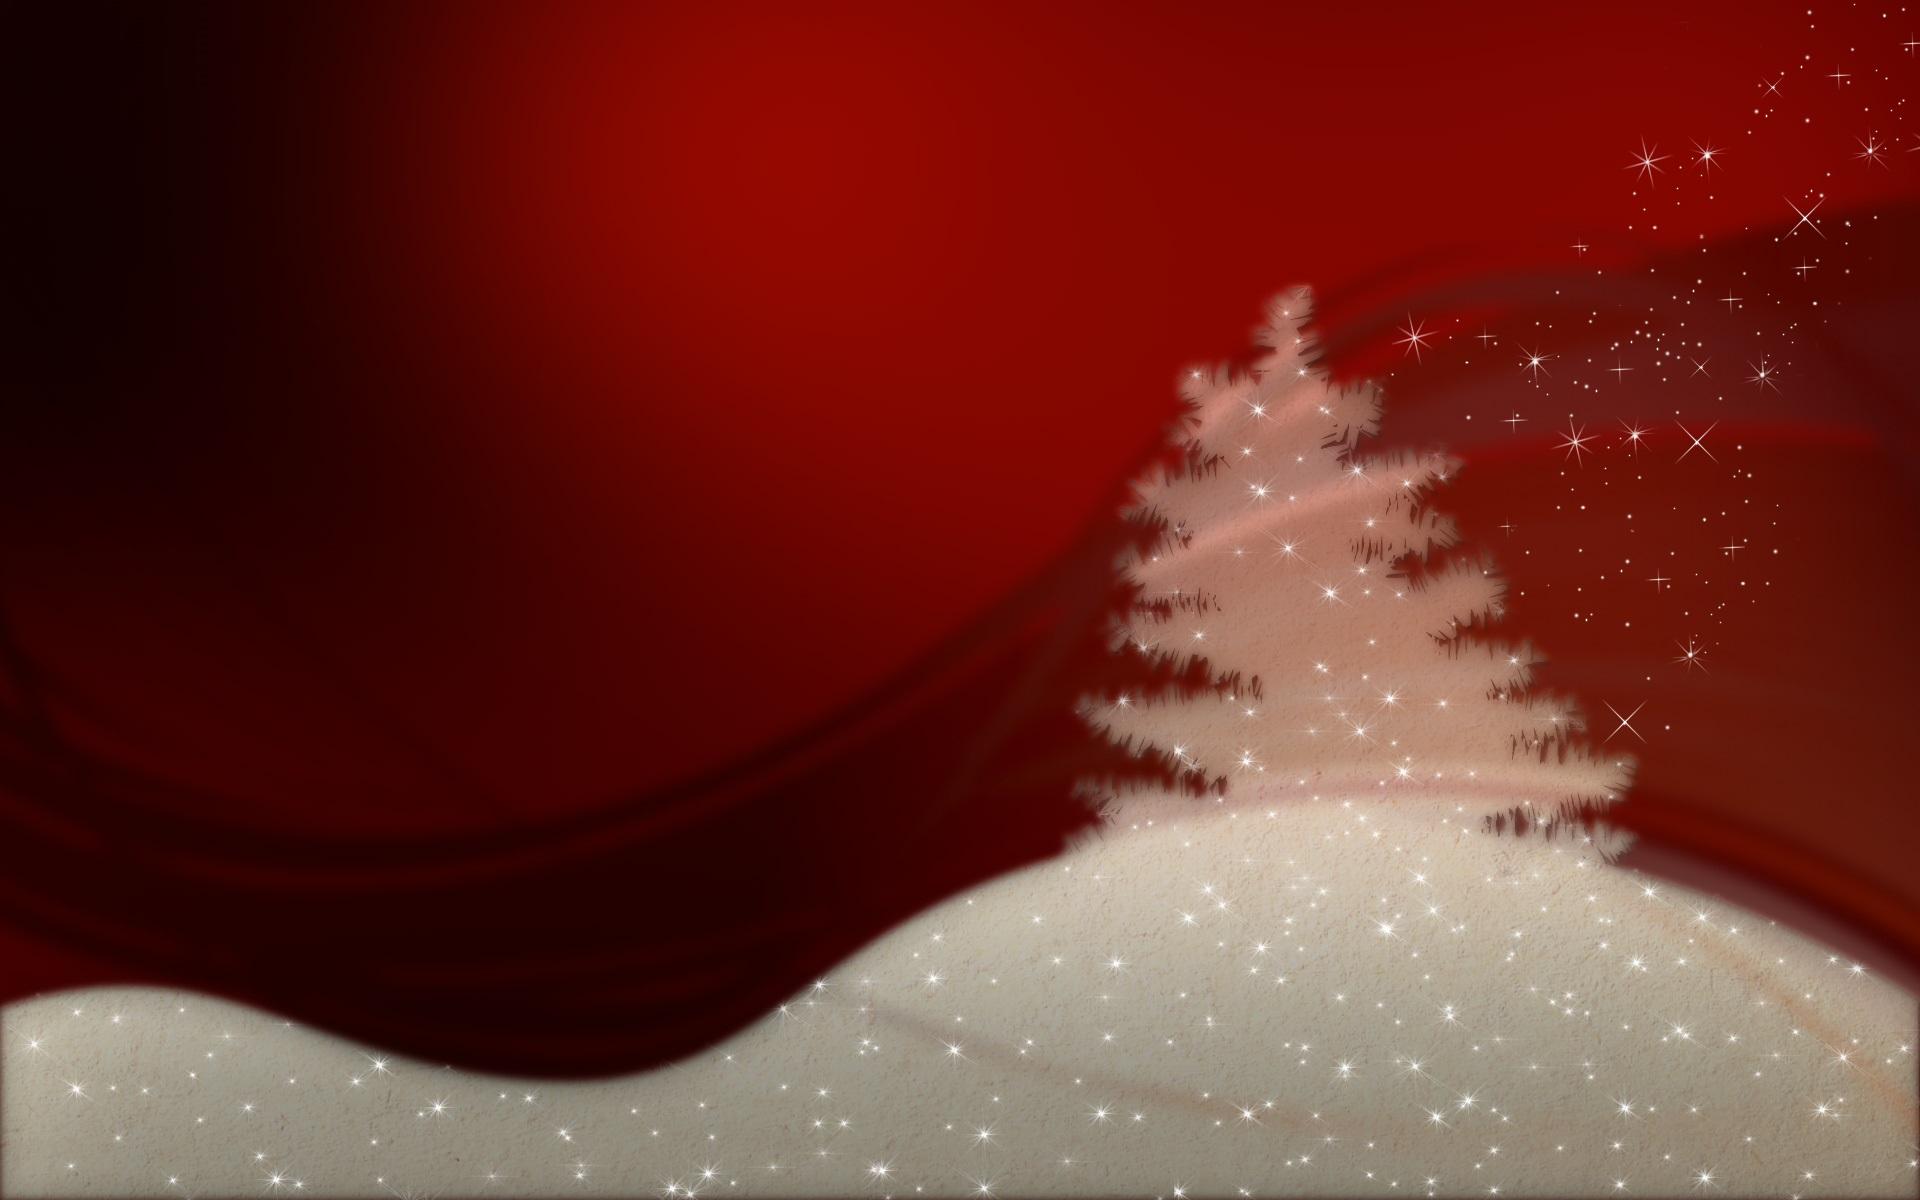 christmas-december-white-background-wallpaper-nocal-smash-desktop-23550